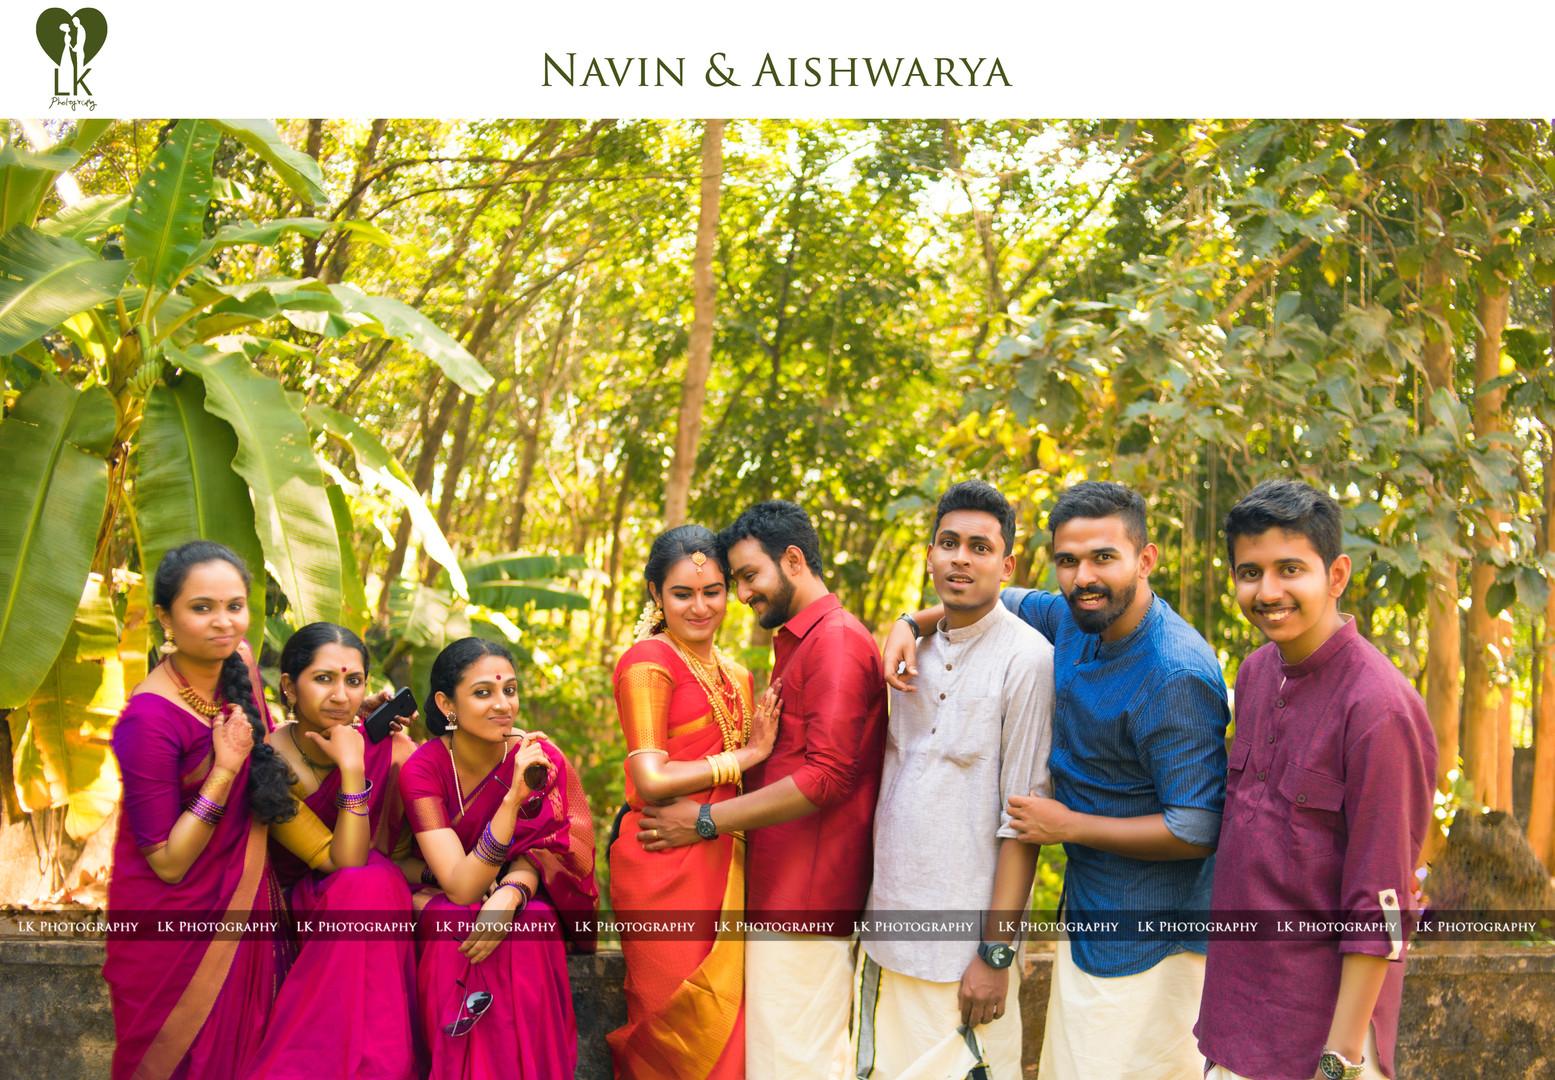 Naveen & Aishwarya